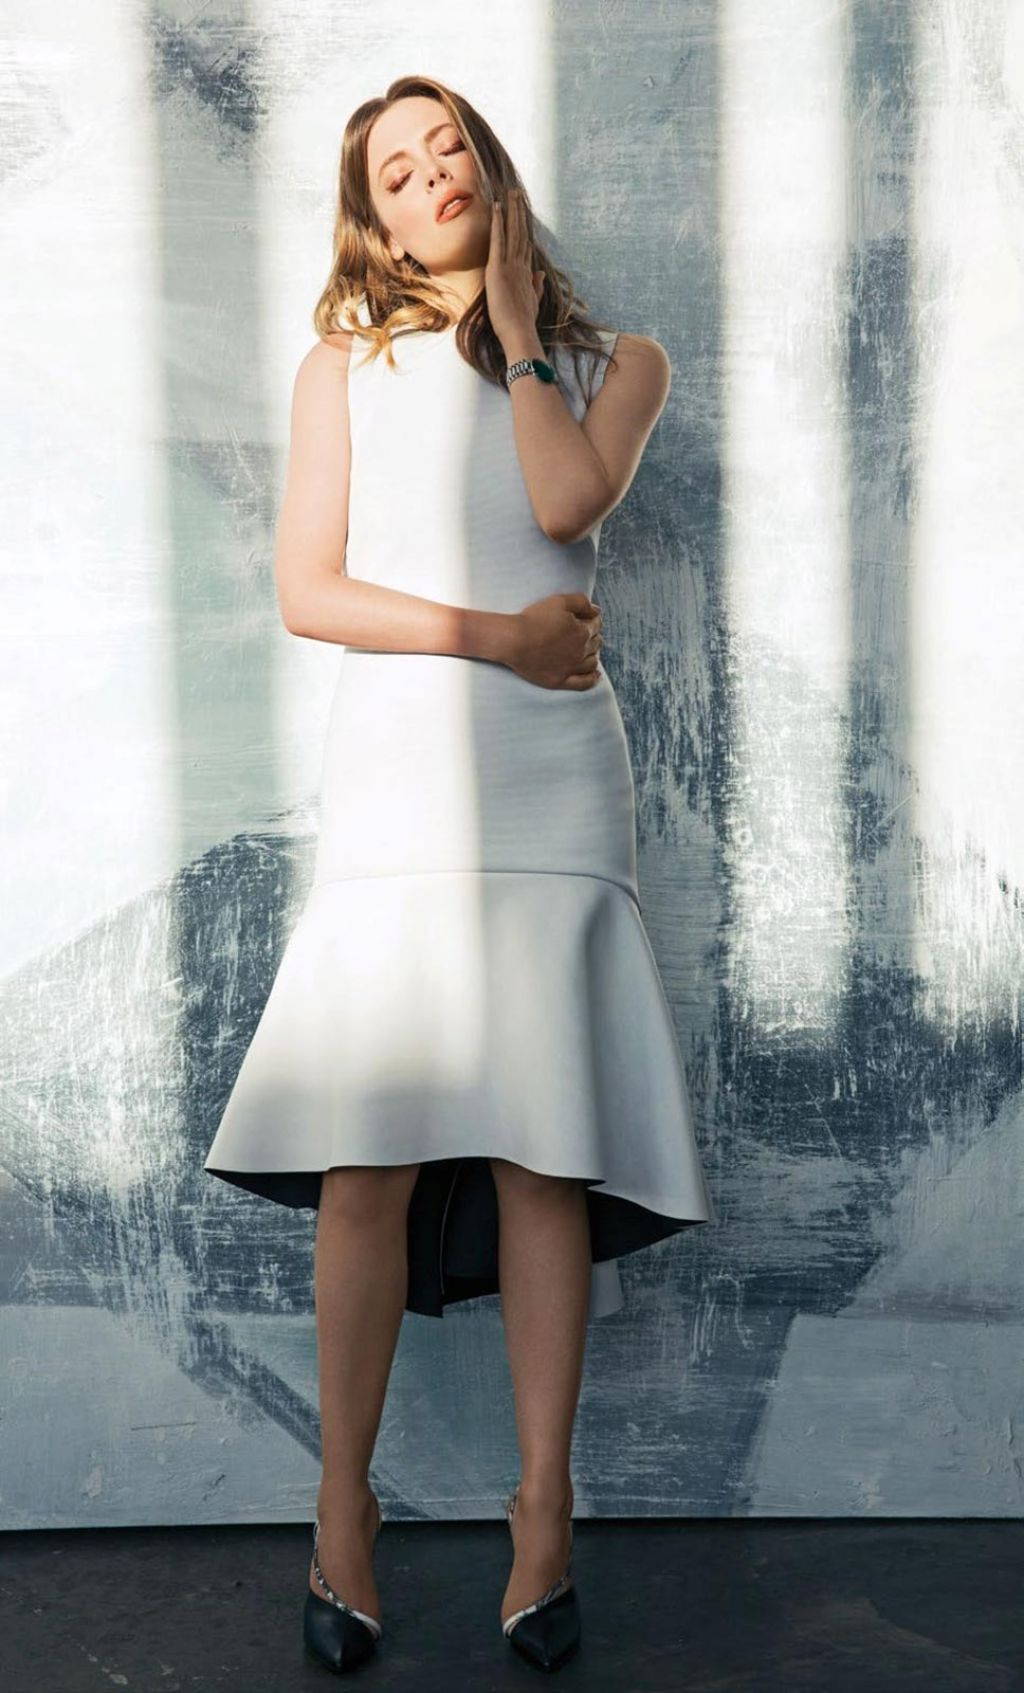 Gillian Jacobs Photoshoot For Flare Magazine January 2015